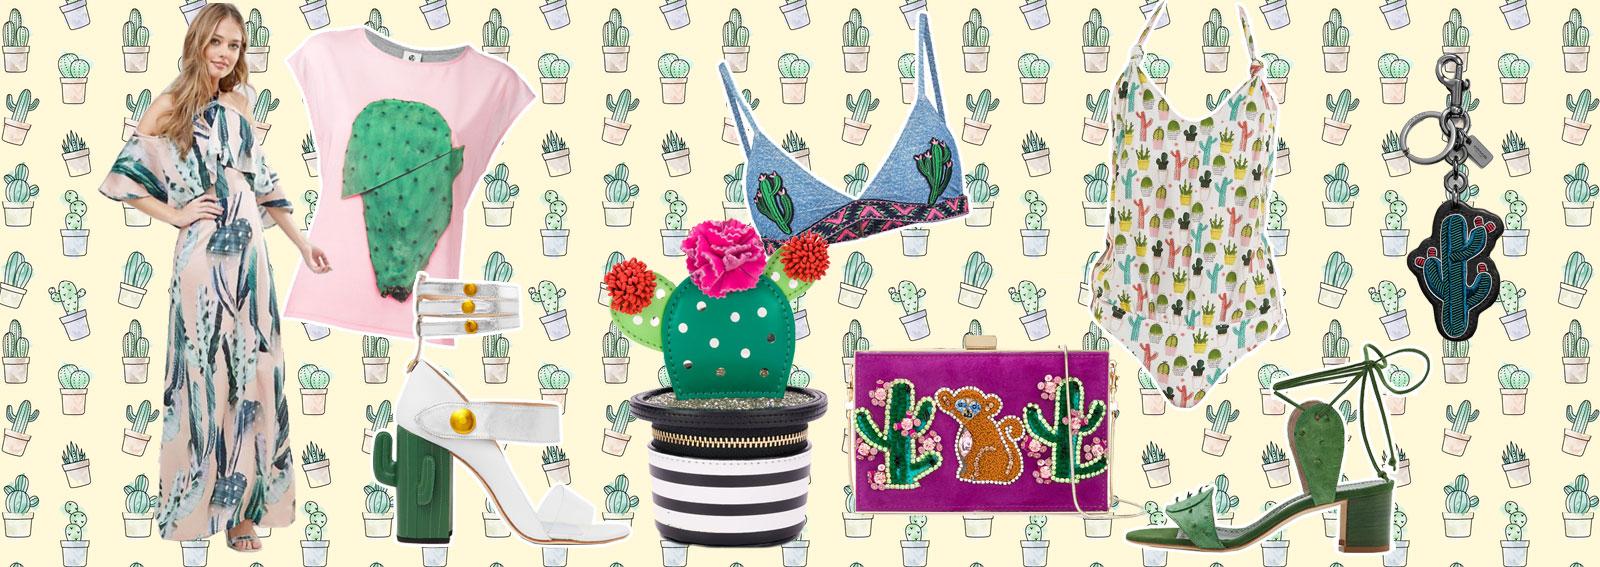 DESKTOP_cactus